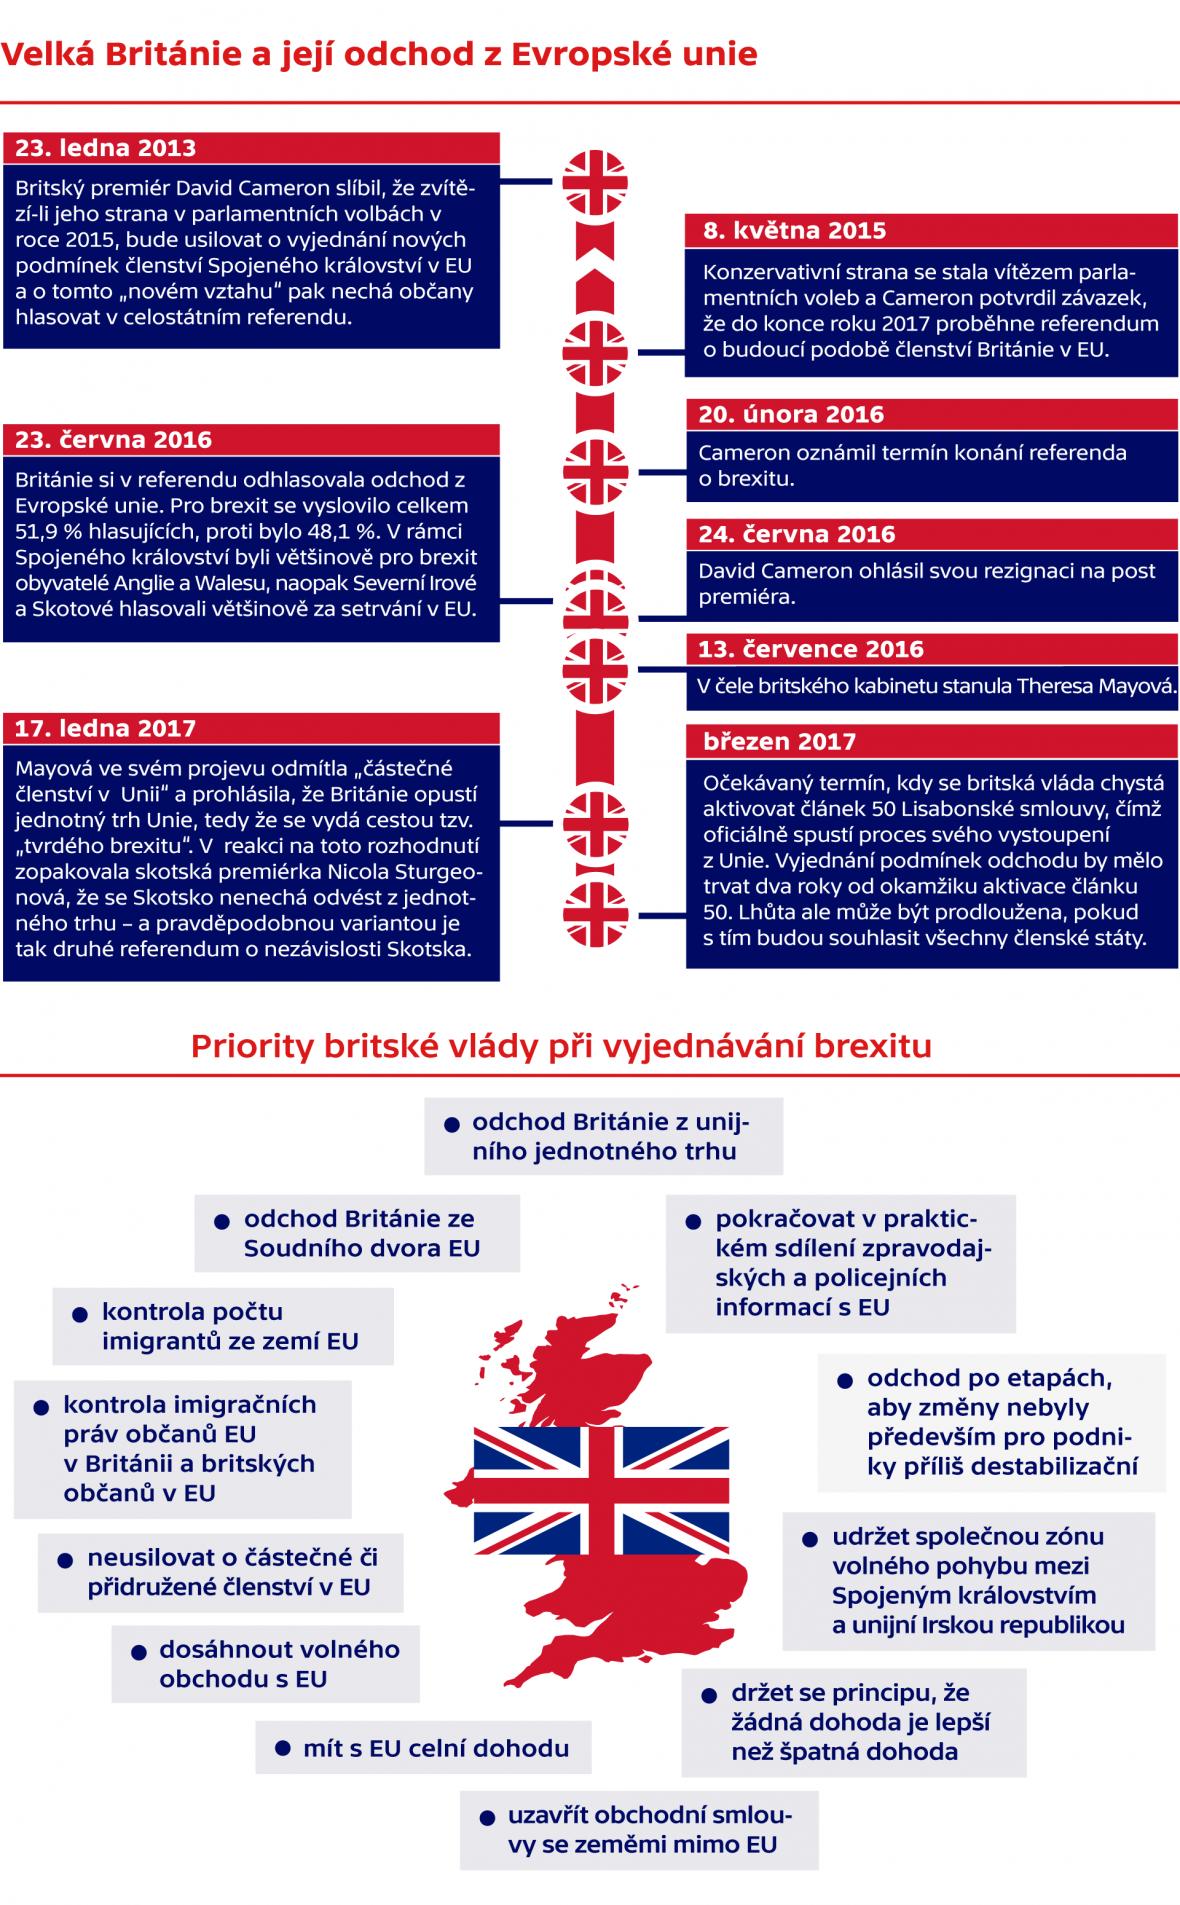 Velká Británie a její odchod z Evropské Unie